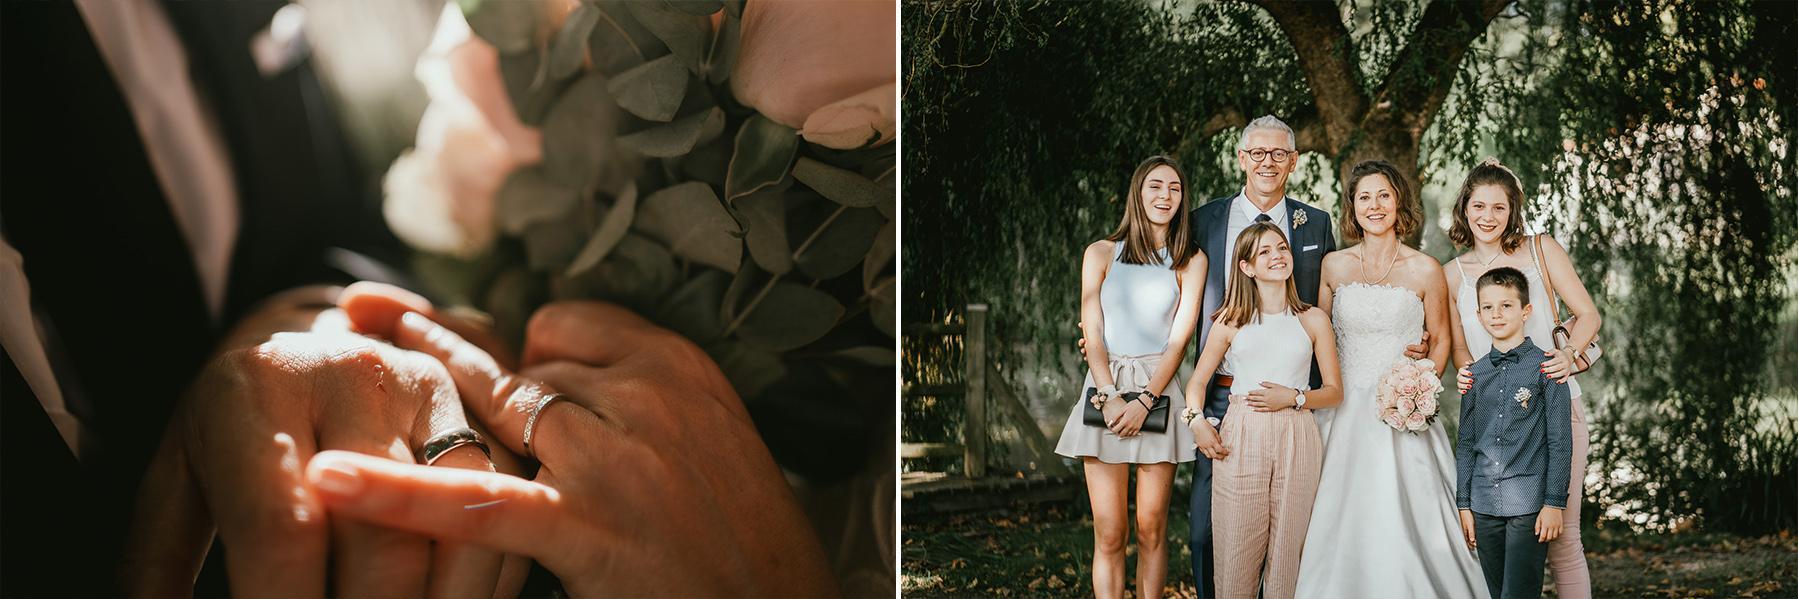 Photographe mariage landes dax aquitaine4